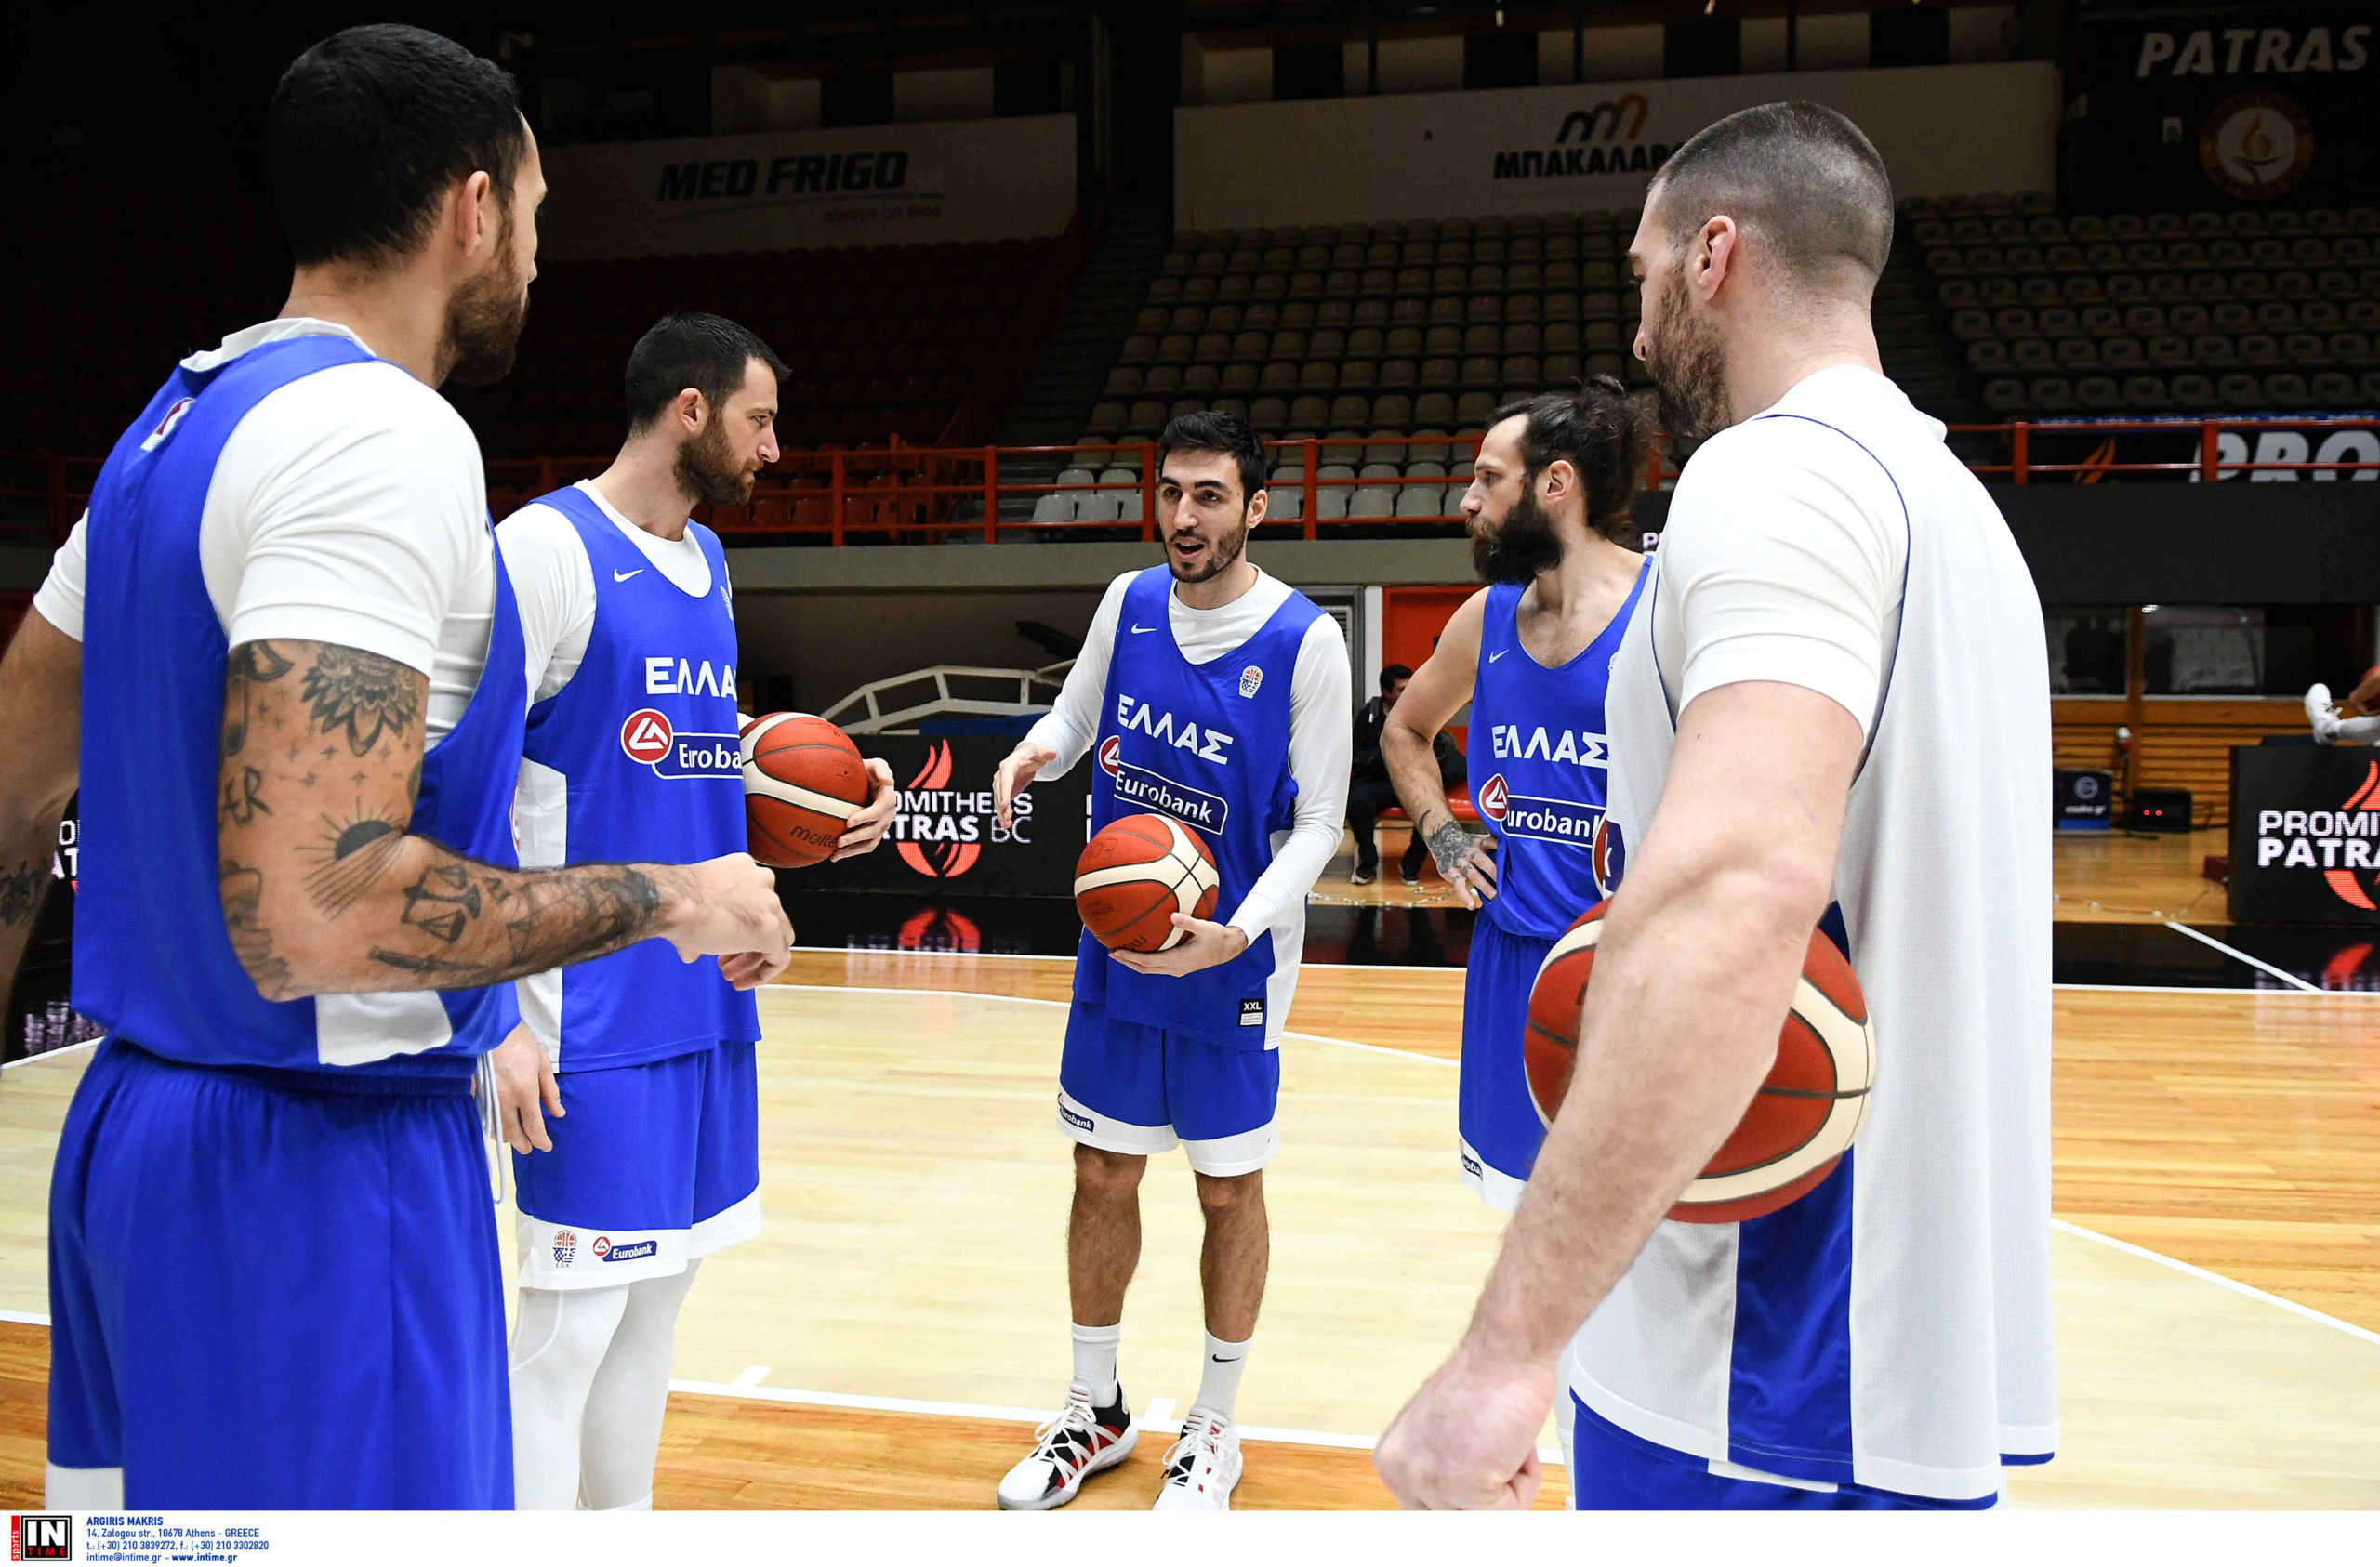 Eurobasket: Στον προκριματικό όμιλο του Σεράγεβο η εθνική ανδρών – Εντός έδρας οι γυναίκες